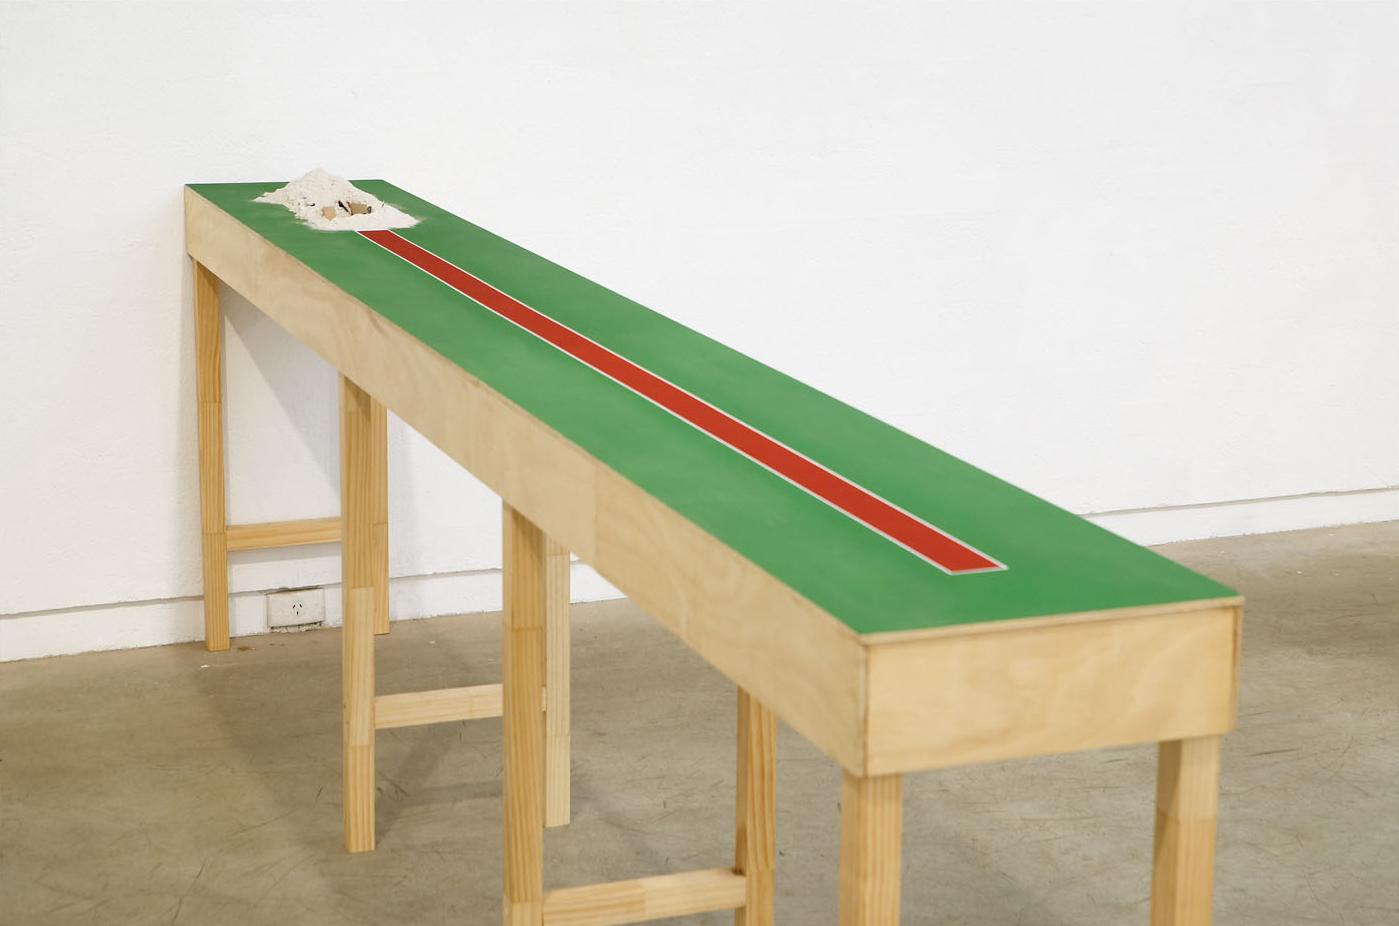 DIGGING IN (2004) Enamel on Plywood, Steel, Casting Sand 2 x 38 x 310 cm